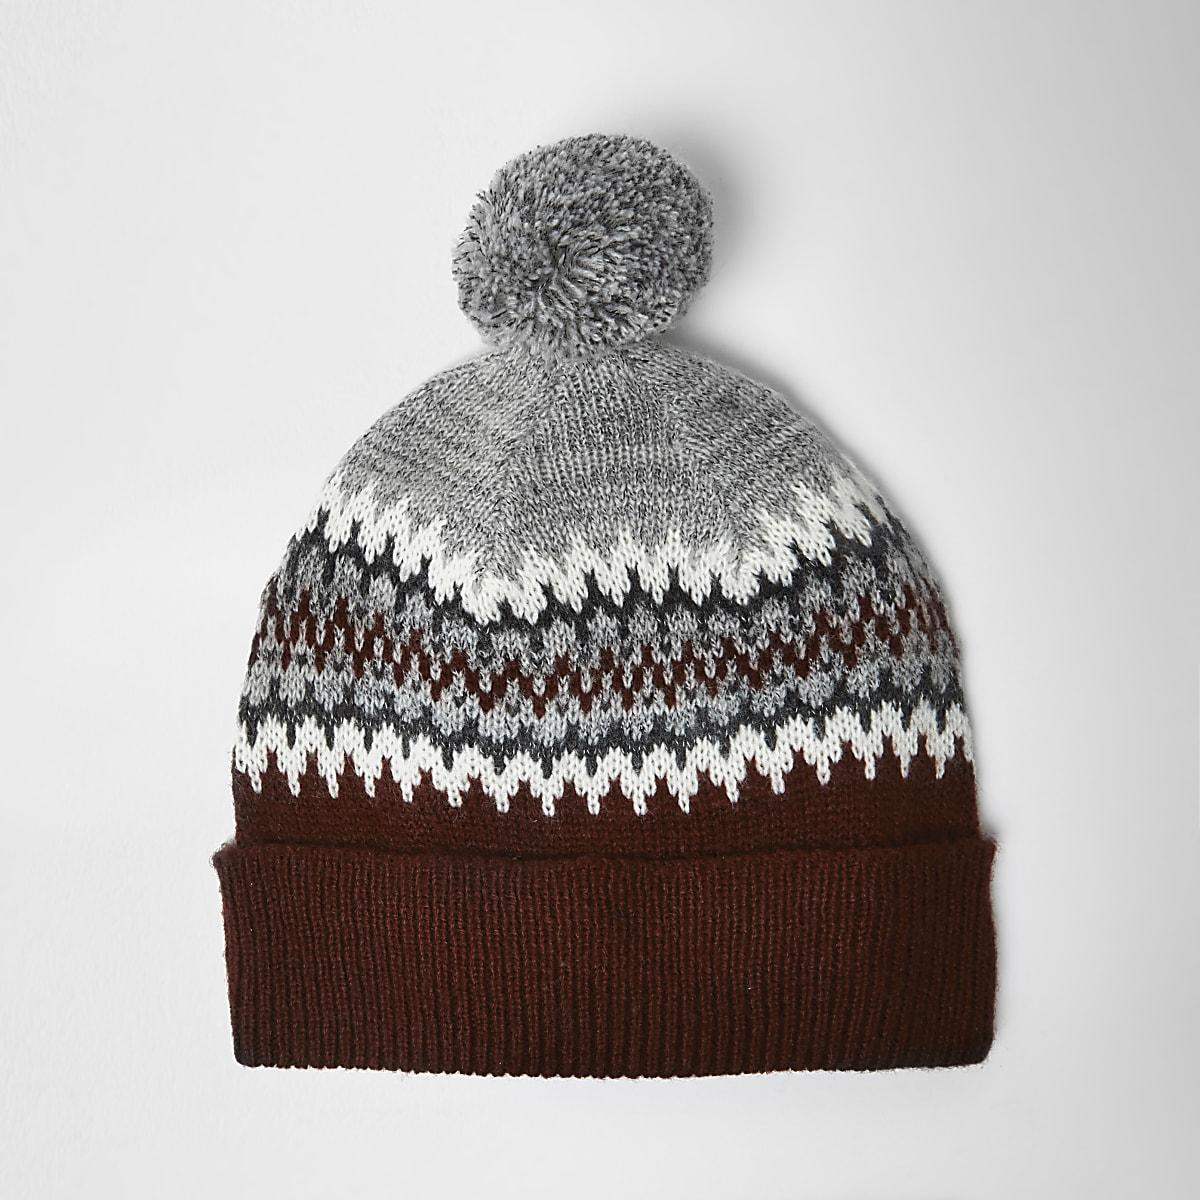 Red Fairisle knit bobble hat